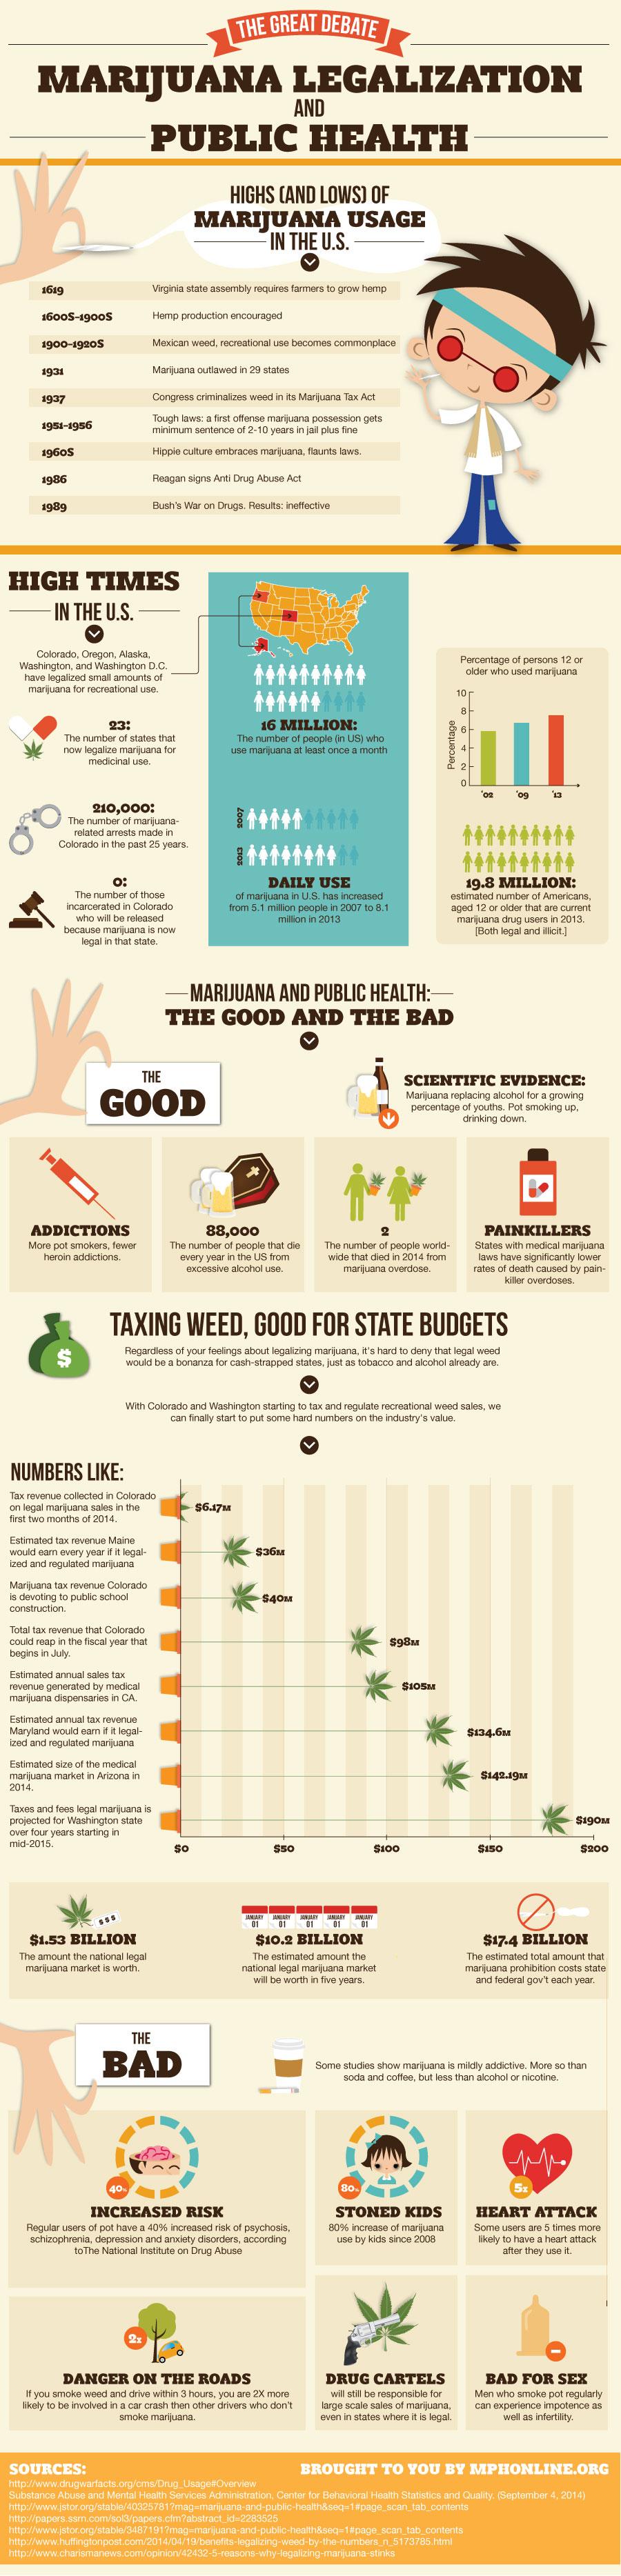 Essay about drug legalization